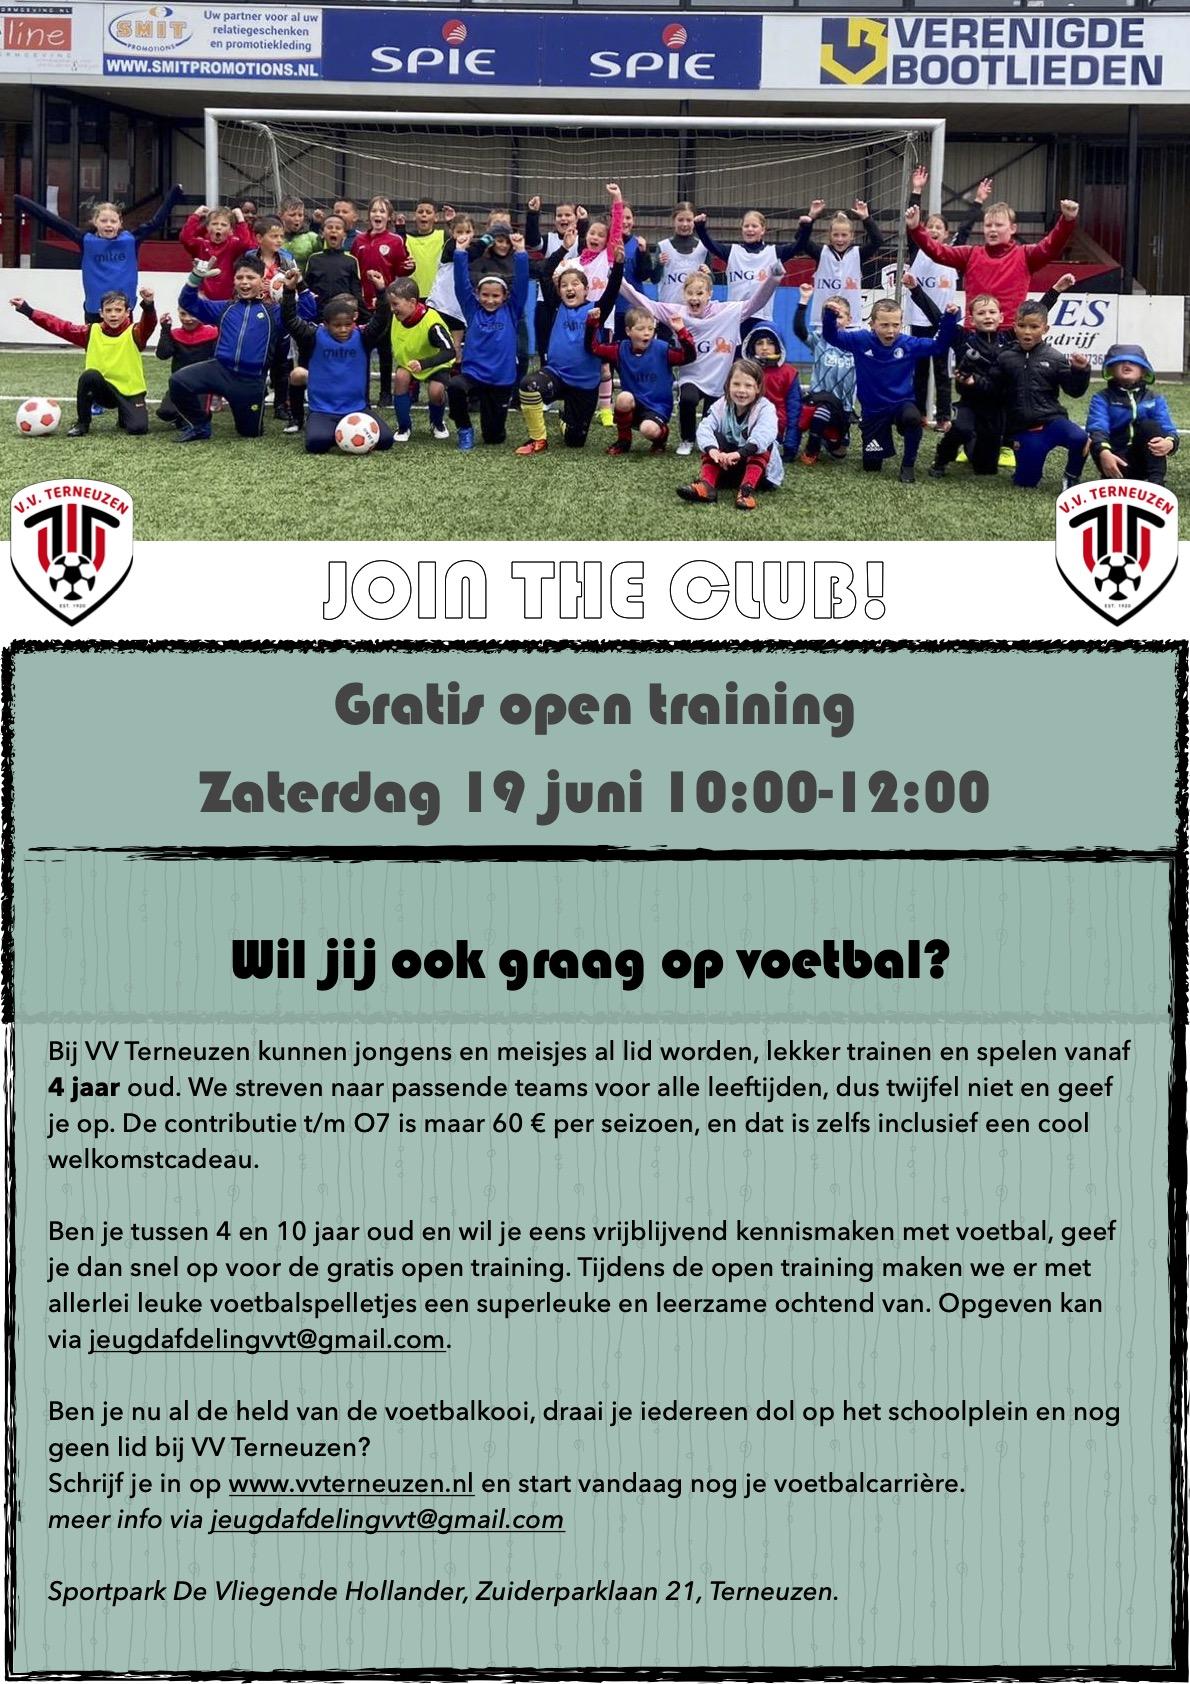 Gratis Open Training Zaterdag 19 Juni 10:00-12:00